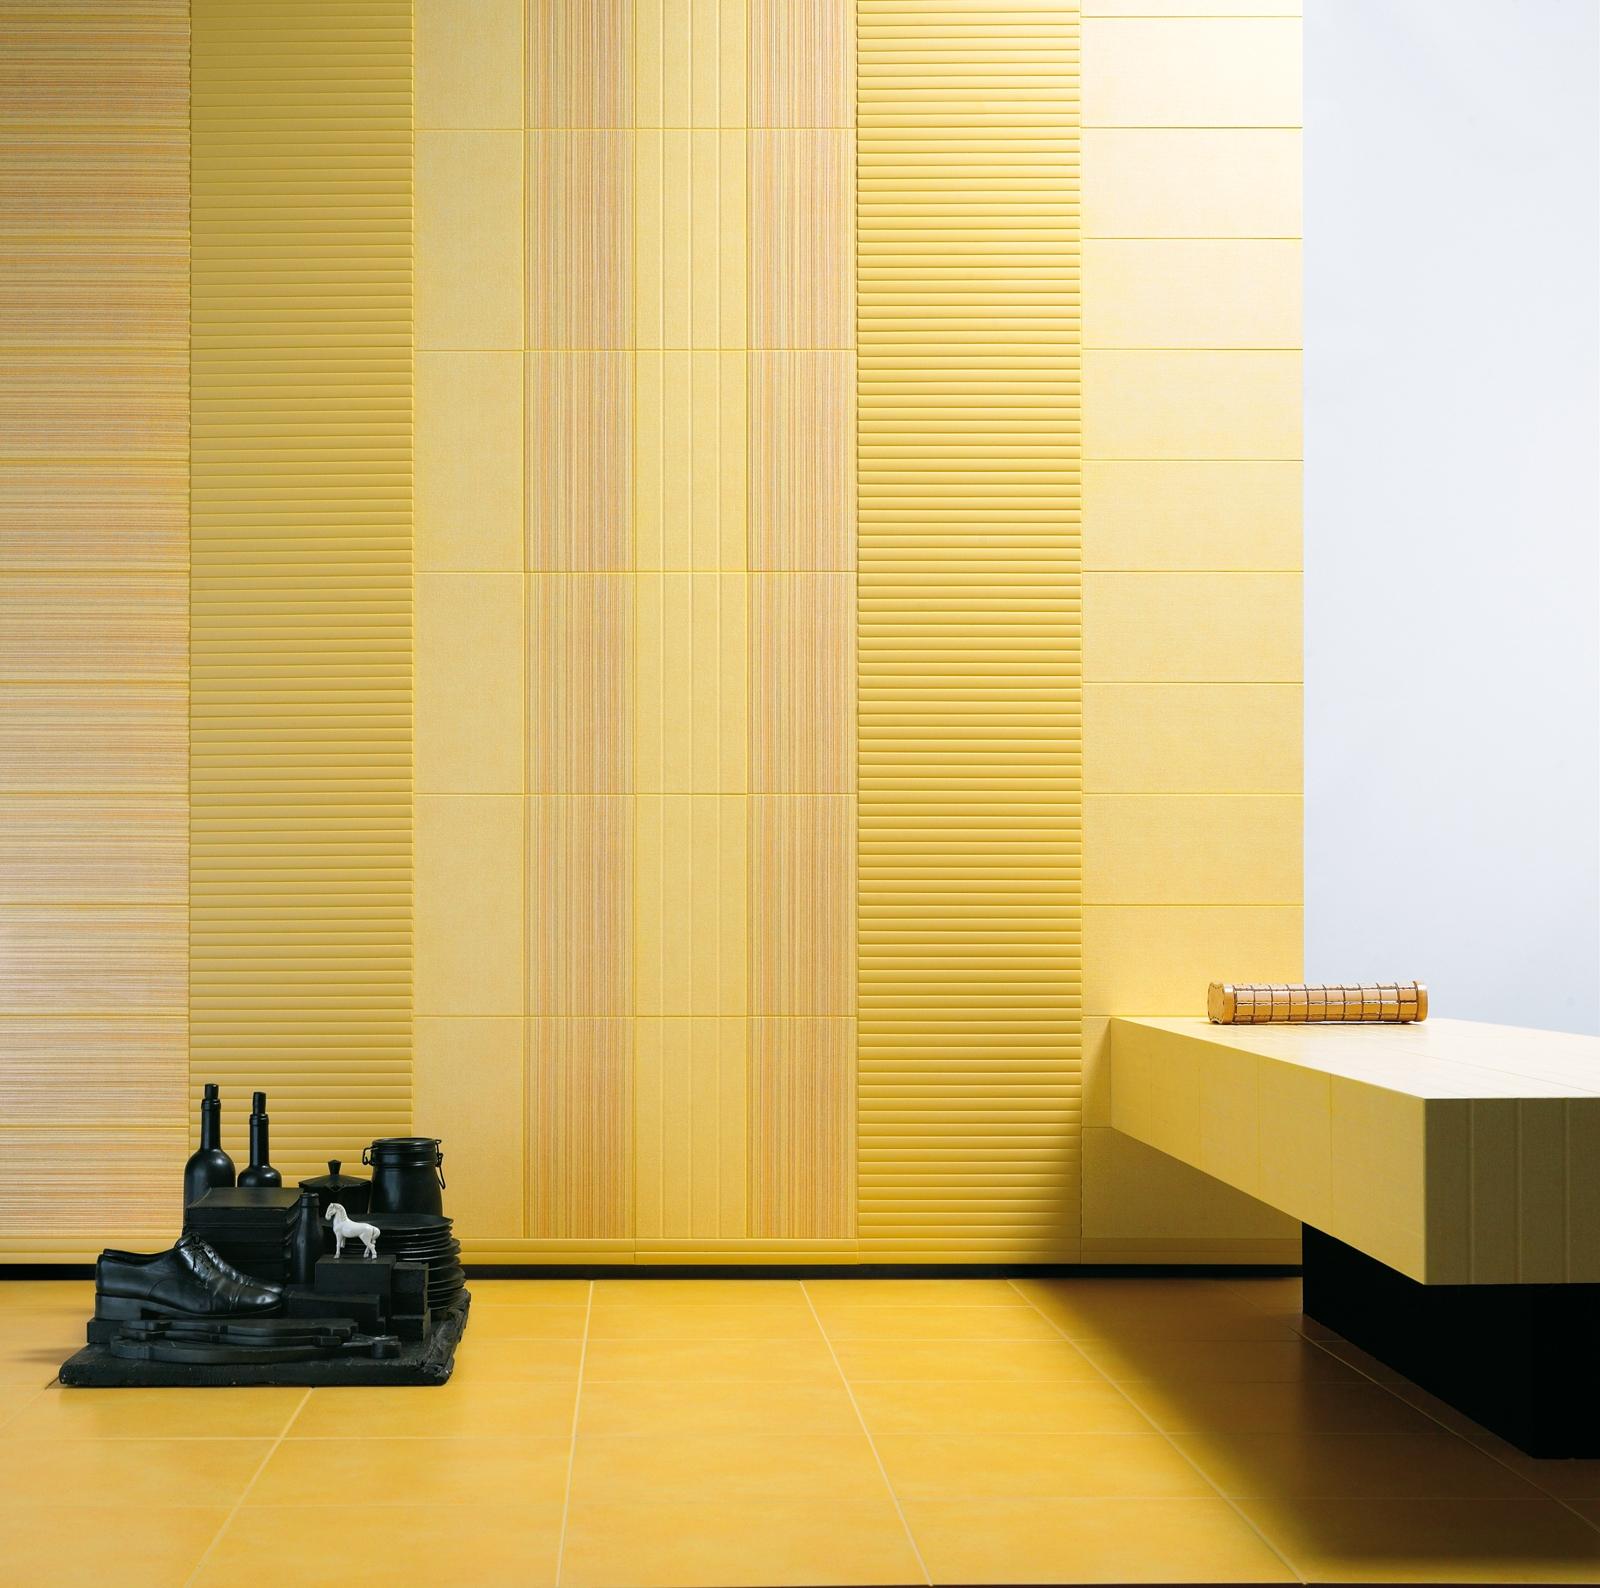 Carrelage jaune en gr s c rame marazzi for Carrelage jaune